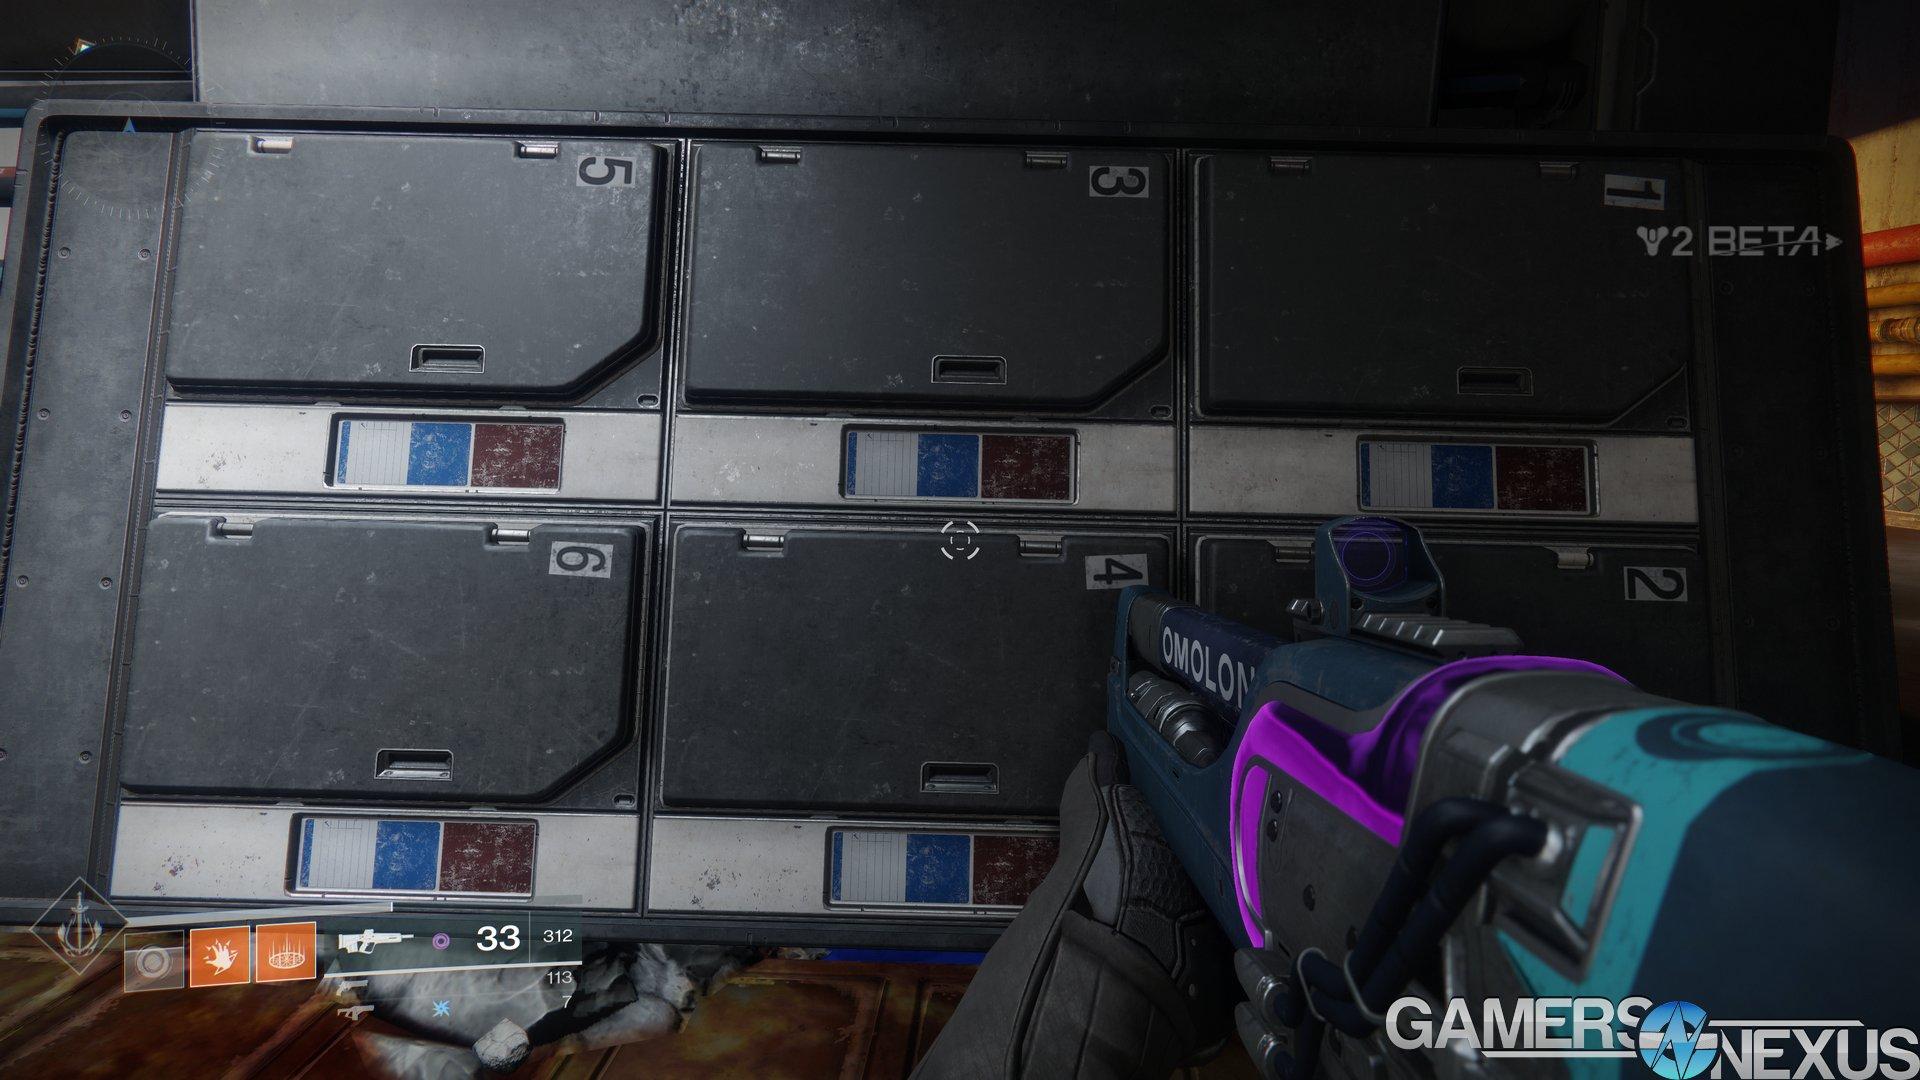 Destiny 2 Texture Quality Comparison | GamersNexus - Gaming